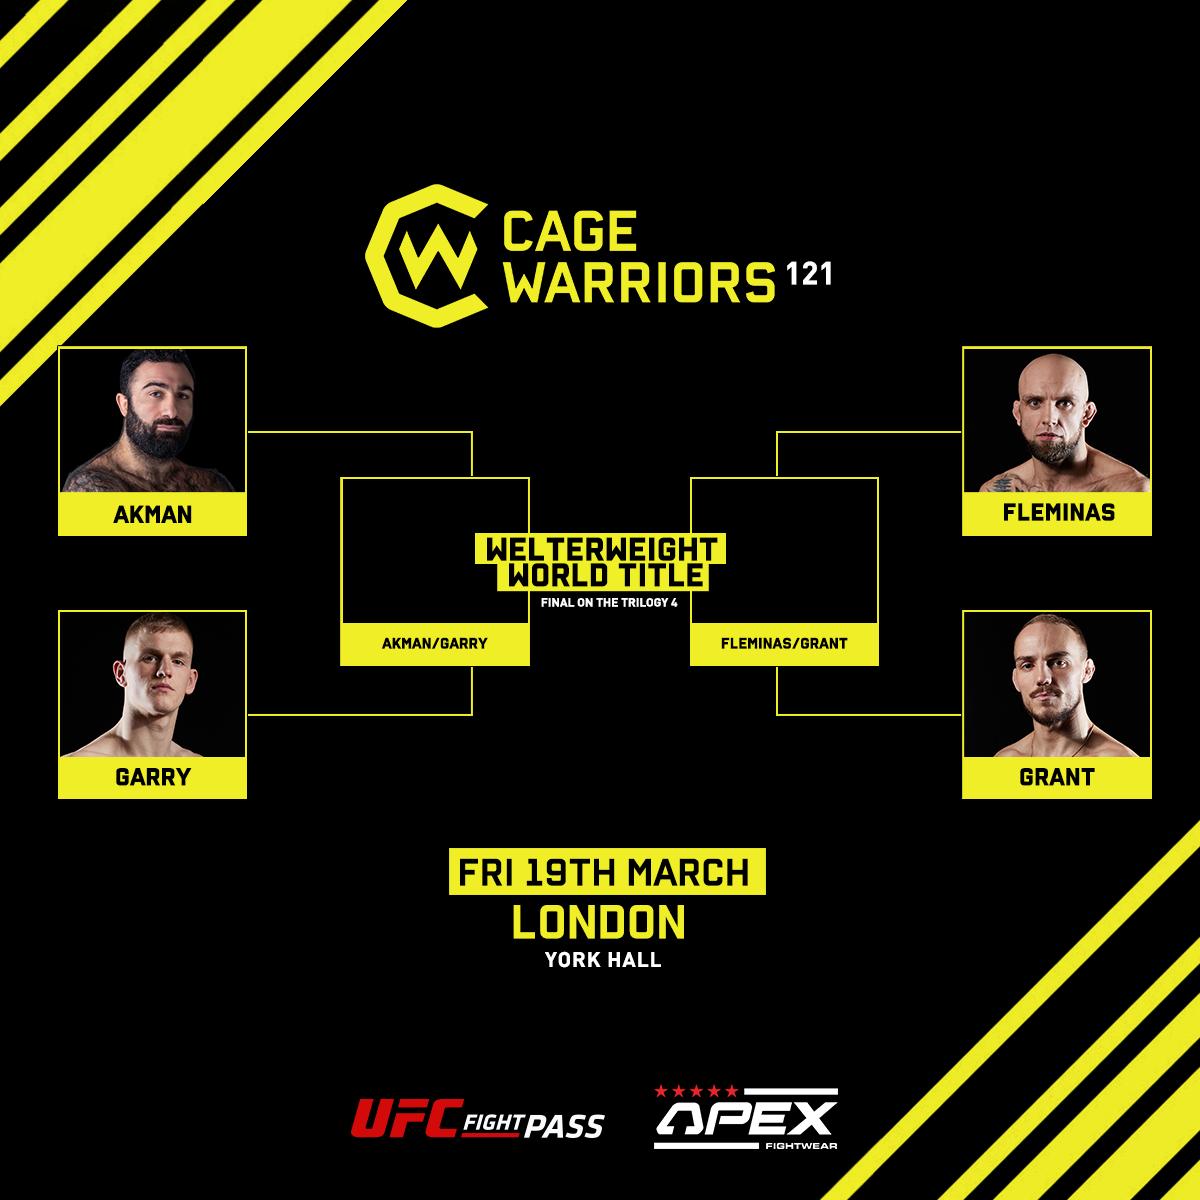 Cage Warriors 121 Turnier